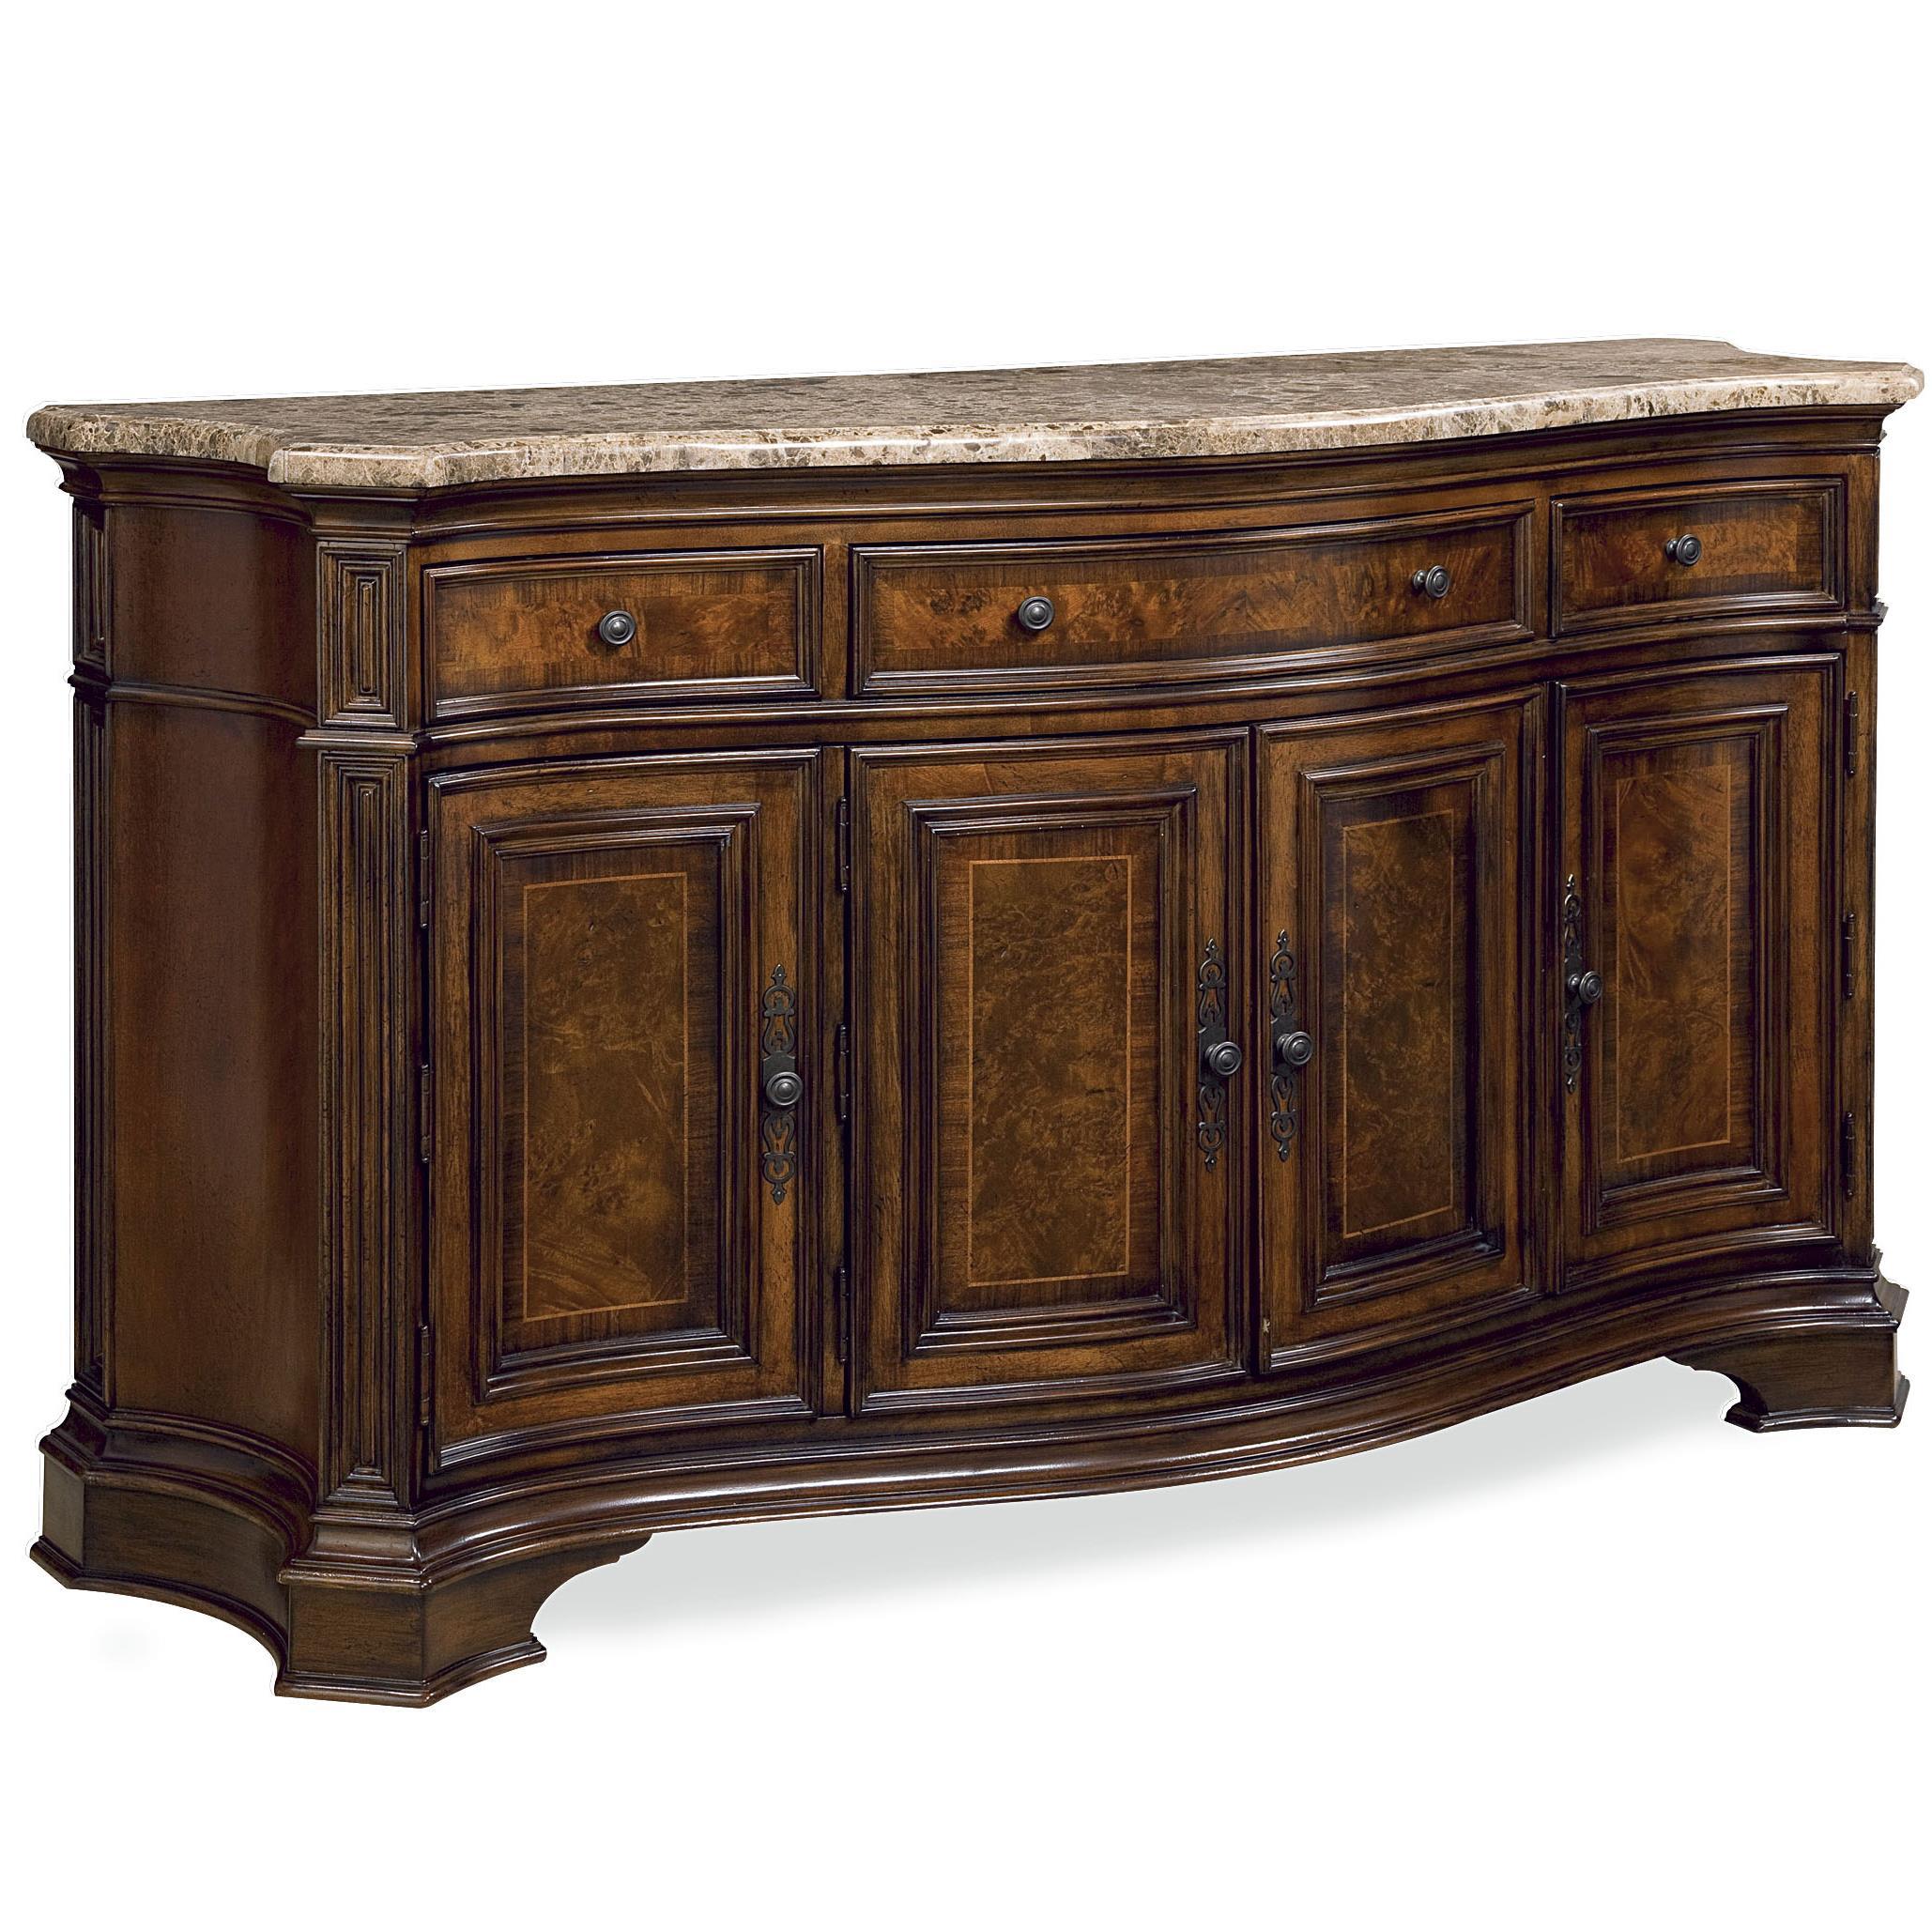 Universal villa cortina 409678 c storage credenza with for Hudsons furniture